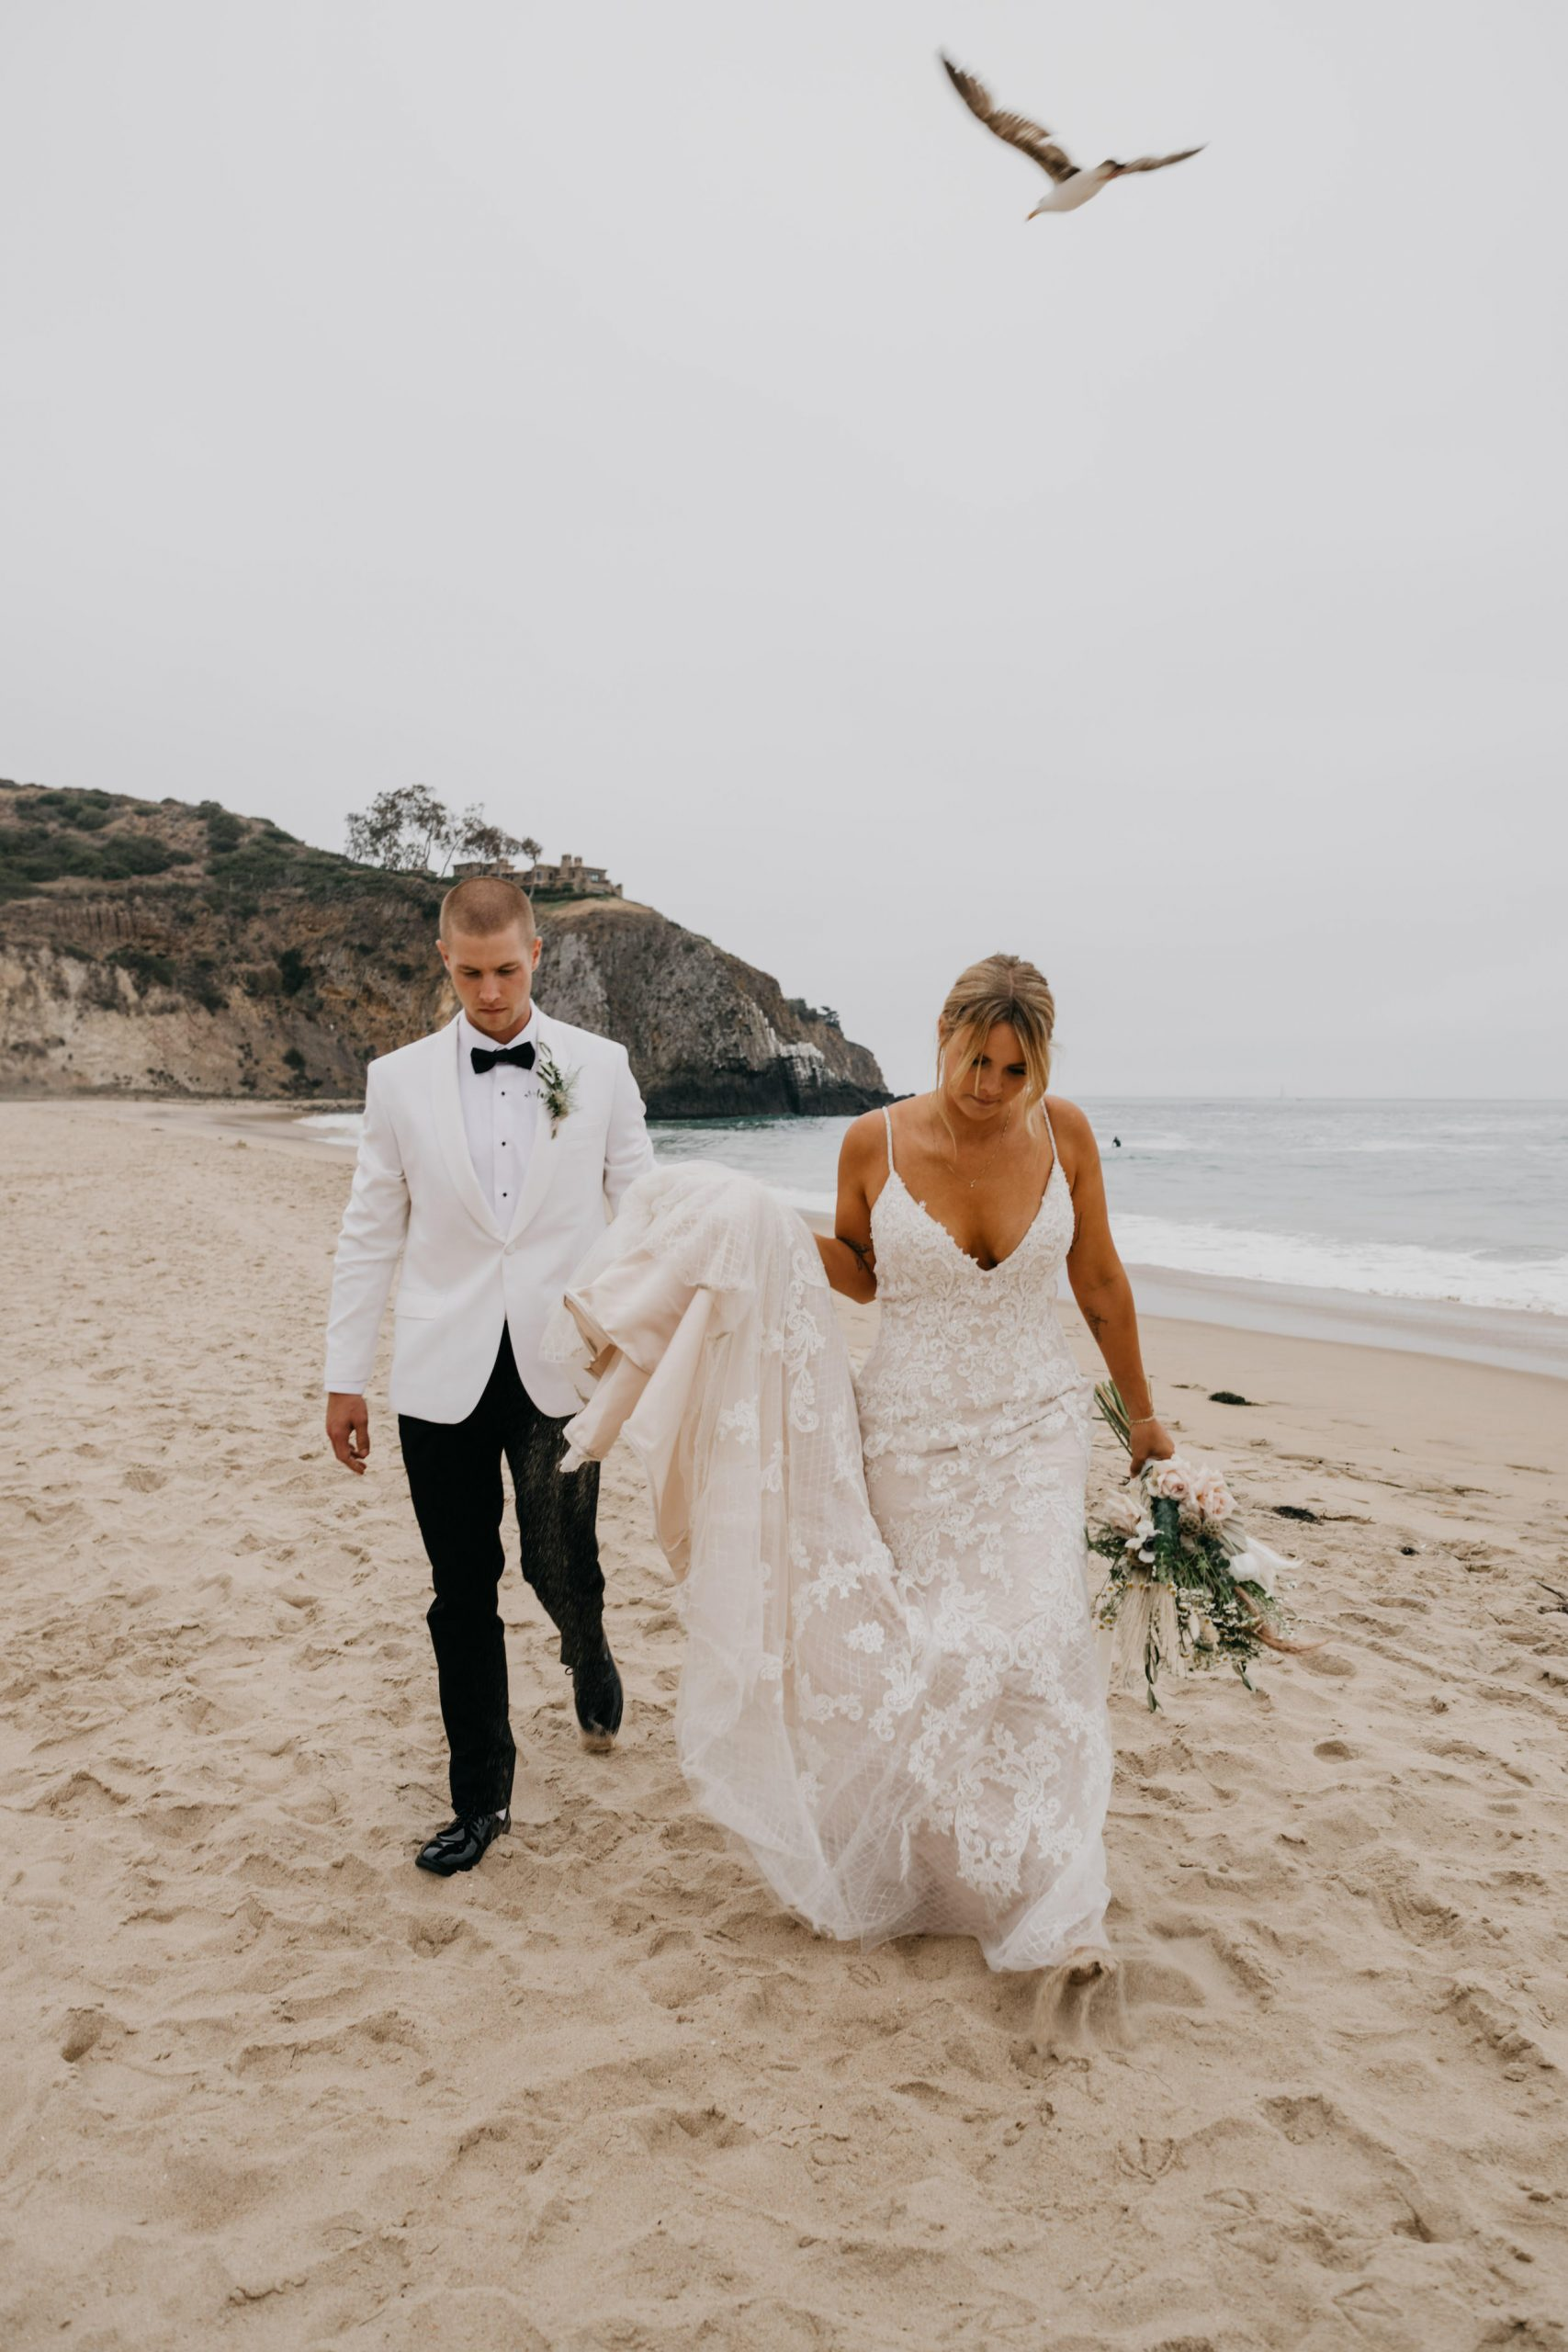 Bride and Groom portraits in Crystal Cove State Park Wedding in Laguna beach, image by Fatima Elreda Photo